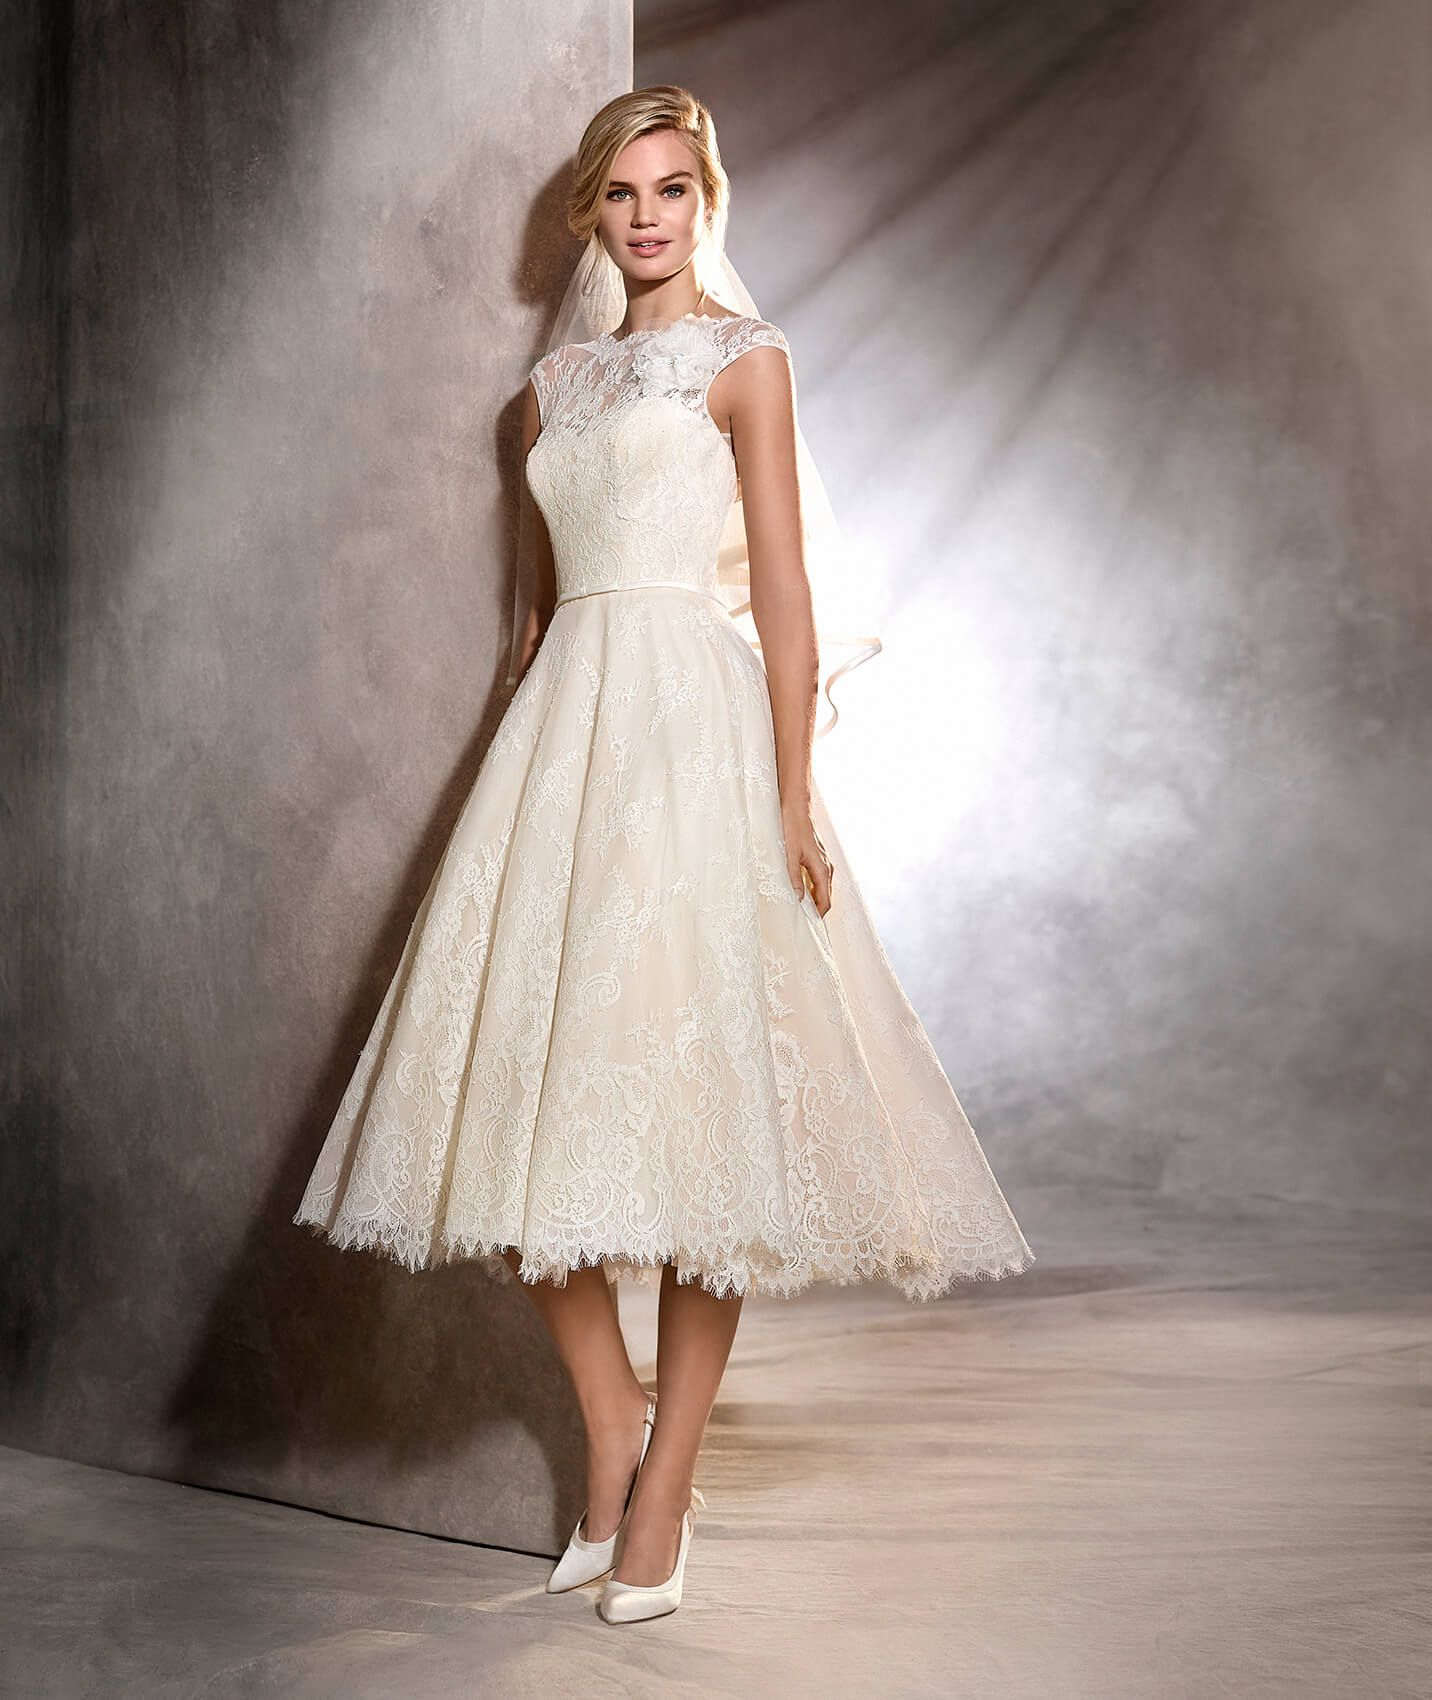 Olga short lace vintage style wedding dress pronovias 2017 olga short lace vintage style wedding dress pronovias 2017 ombrellifo Image collections